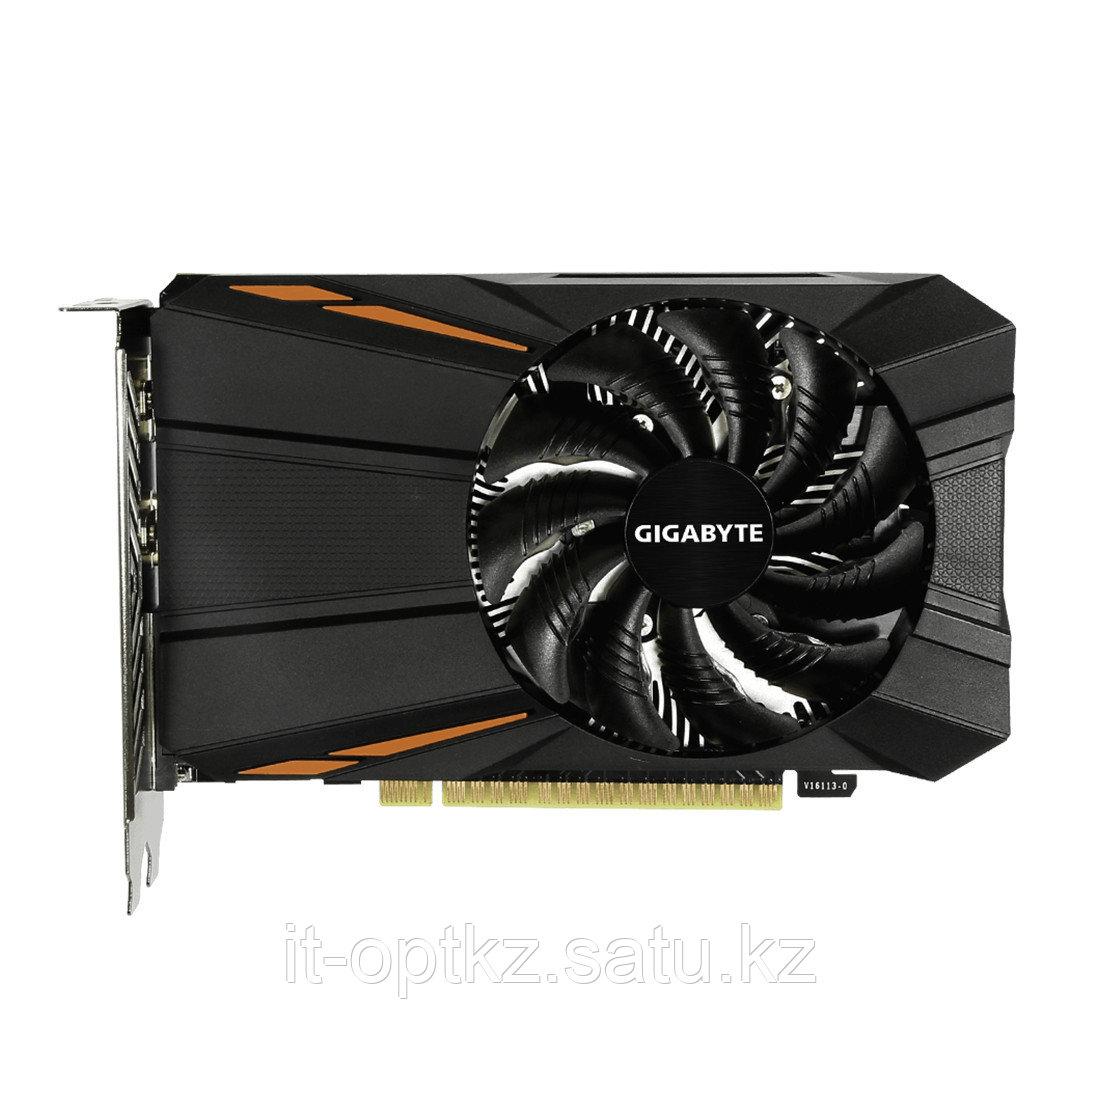 Видеокарта Gigabyte (GV-N105TD5-4GD) GTX1050Ti 4G